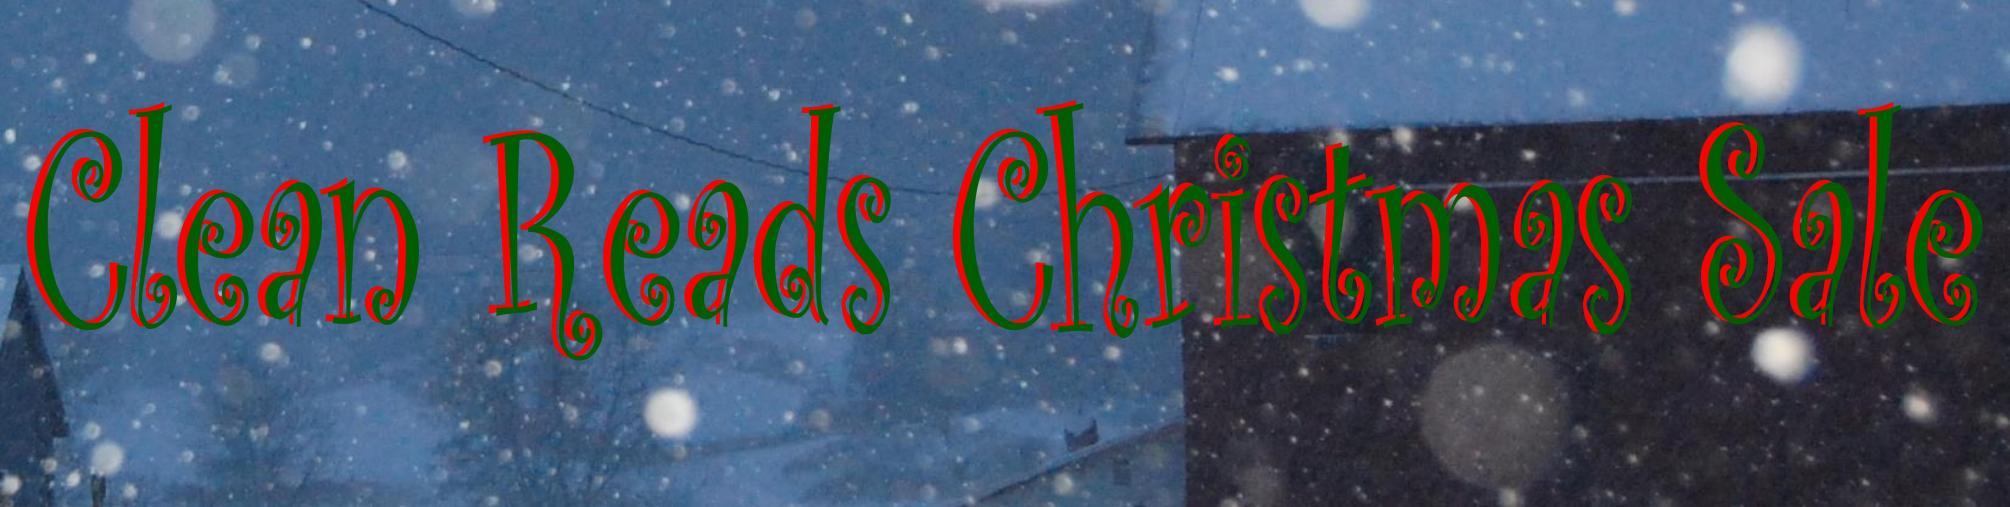 CIR Christmas Sale Banner2 copy